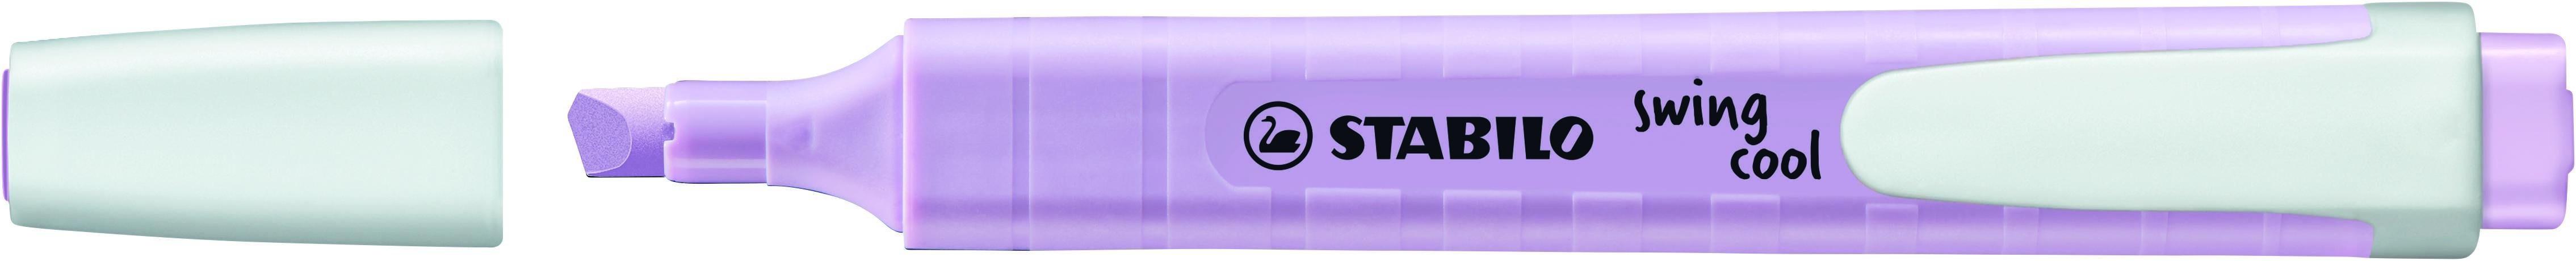 STABILO swing cool Pastel - Surligneur - brume de lilas